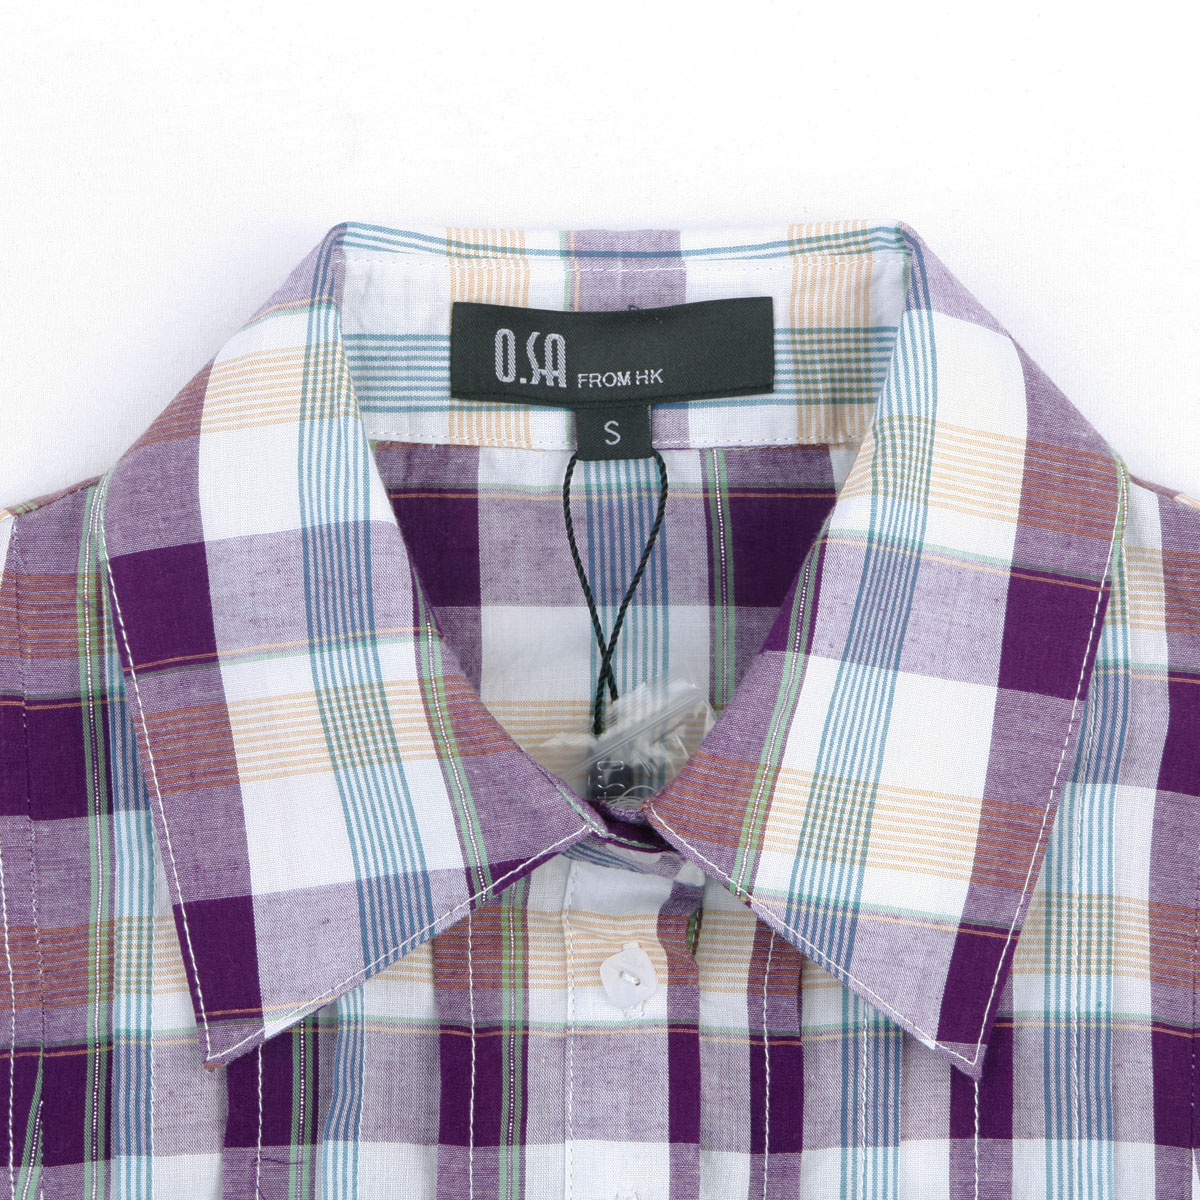 женская рубашка OSA sc90202 O.SA OL C90202